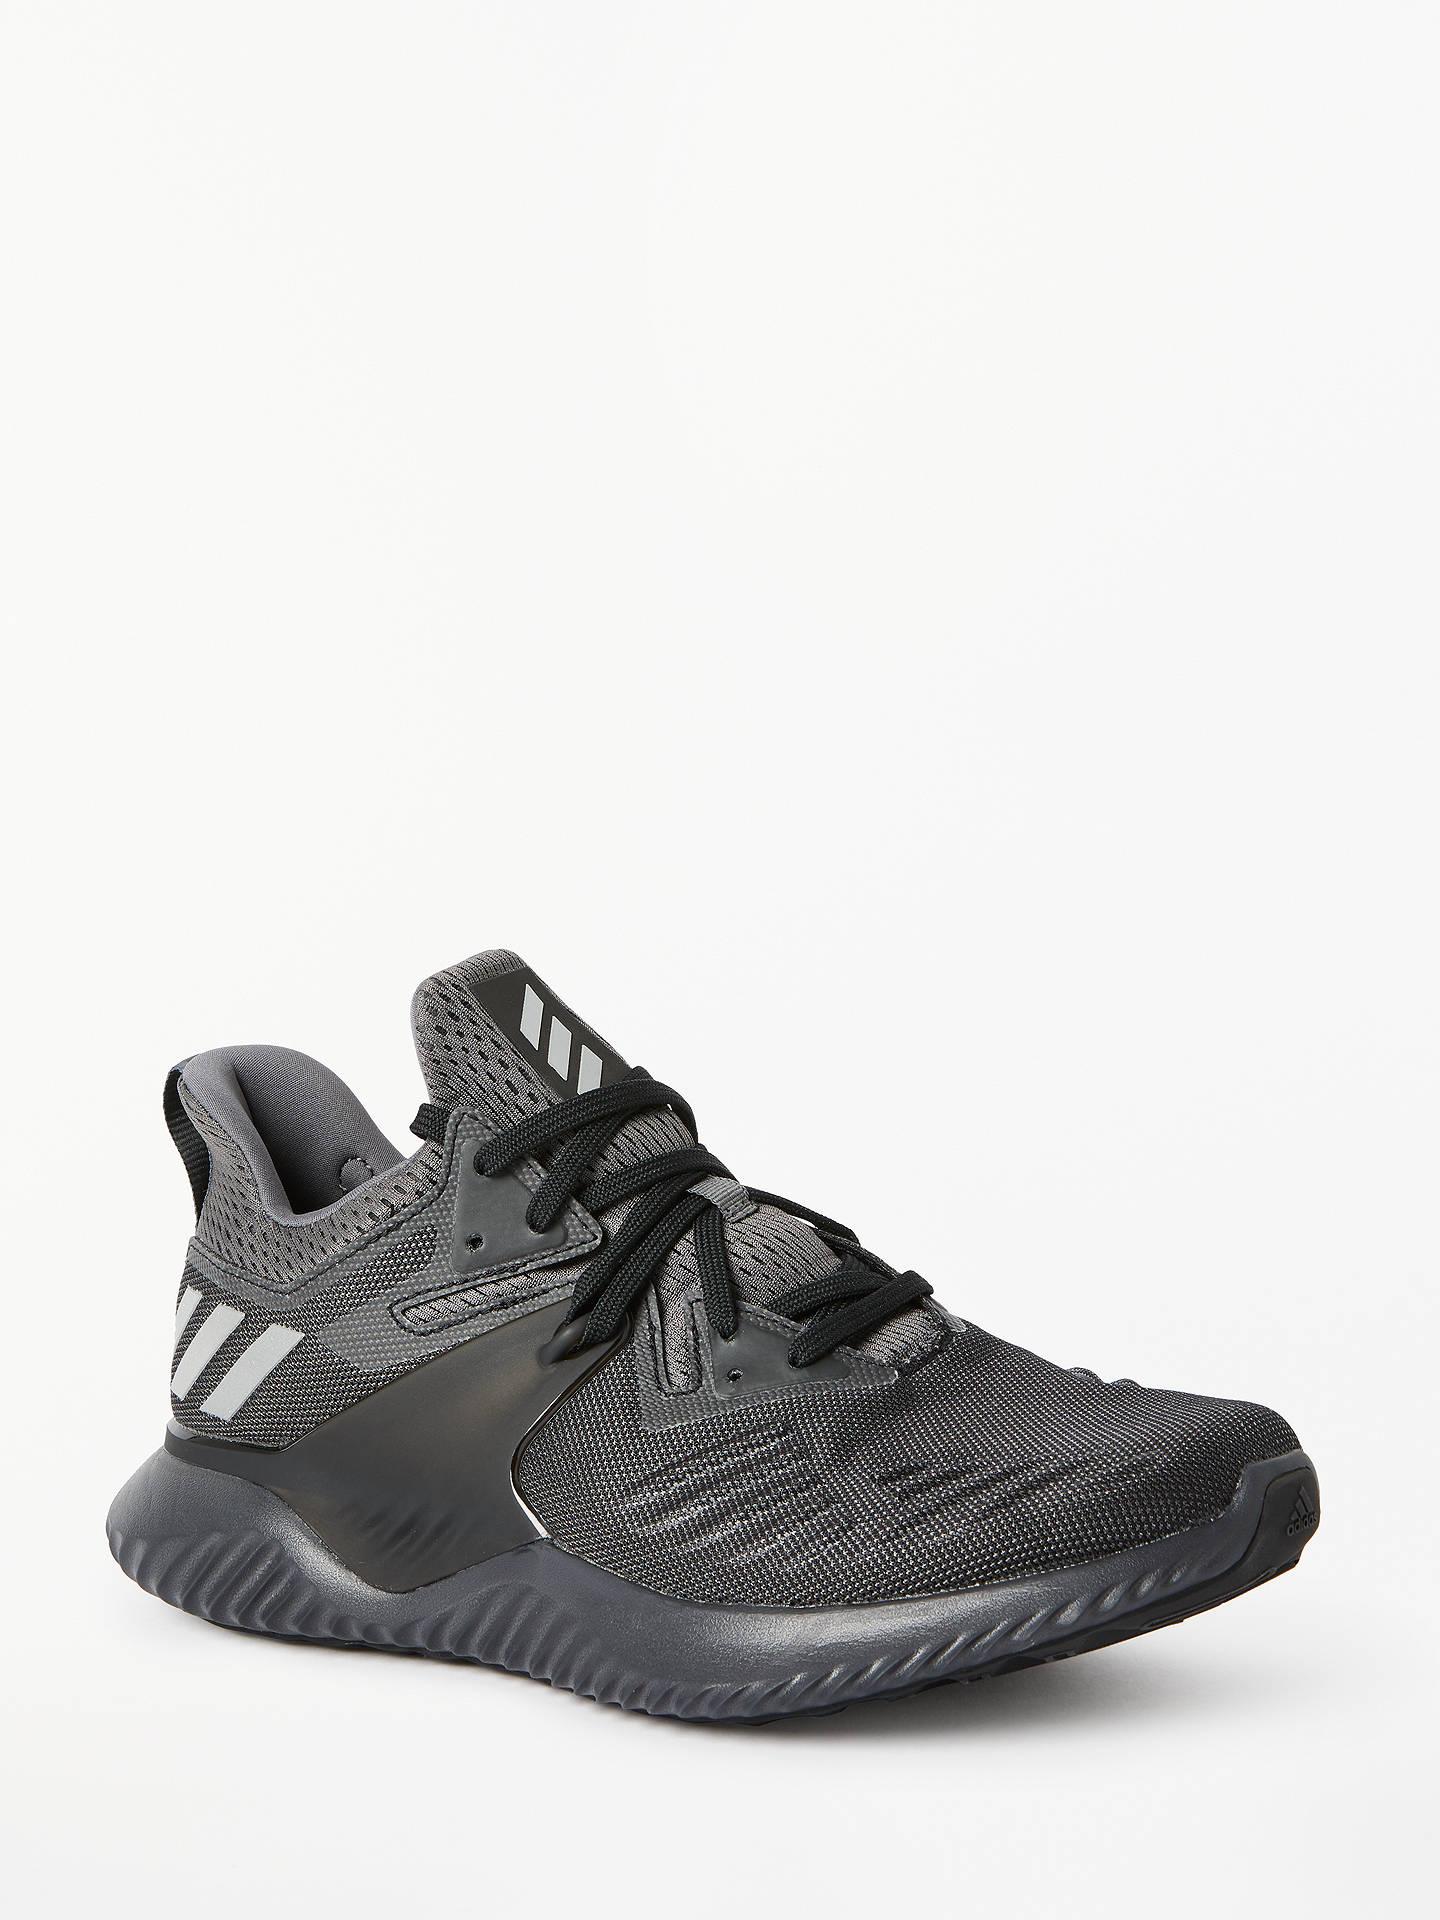 b3a299d30f610 adidas Alphabounce Beyond 2.0 Men s Running Shoes at John Lewis ...